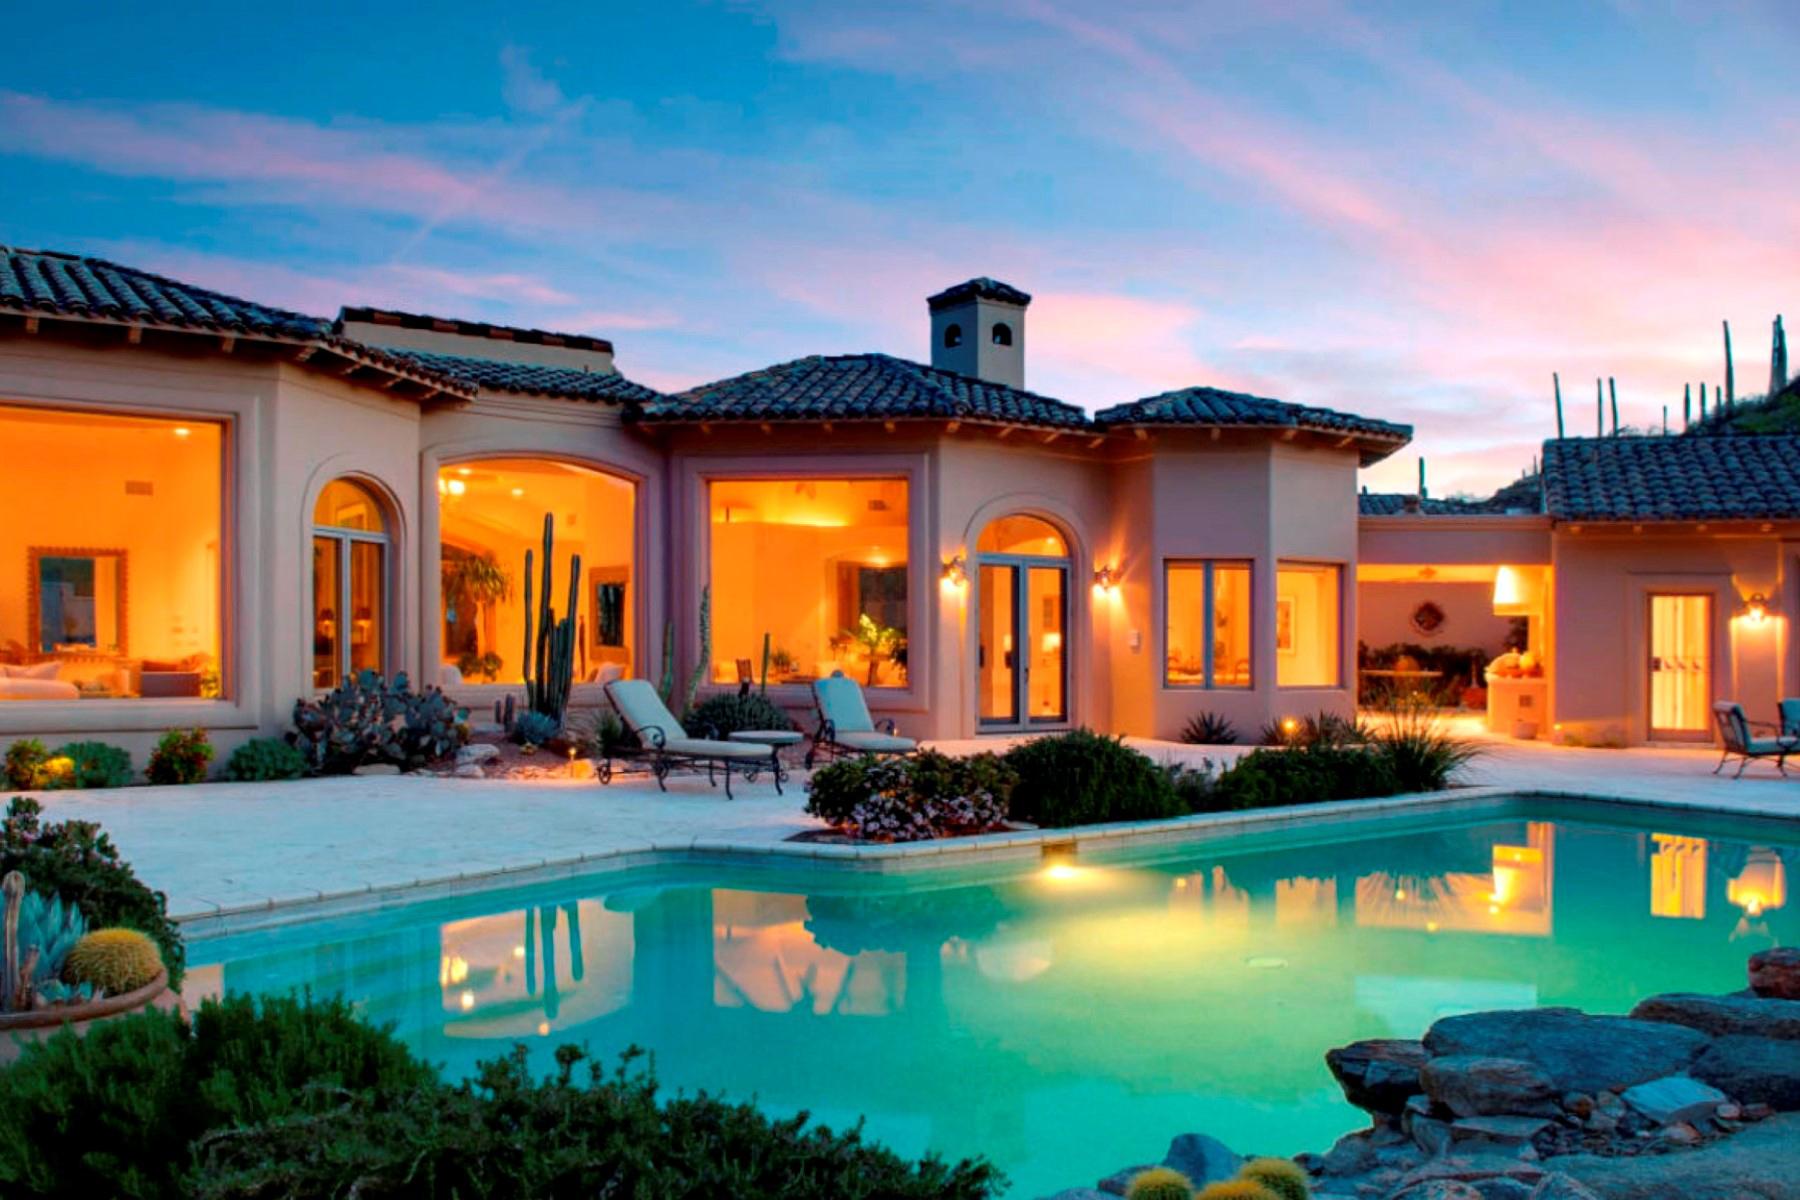 獨棟家庭住宅 為 出售 在 Elegant Mediterranean Style Estate 7391 N Finger Rock Place Tucson, 亞利桑那州 85719 美國